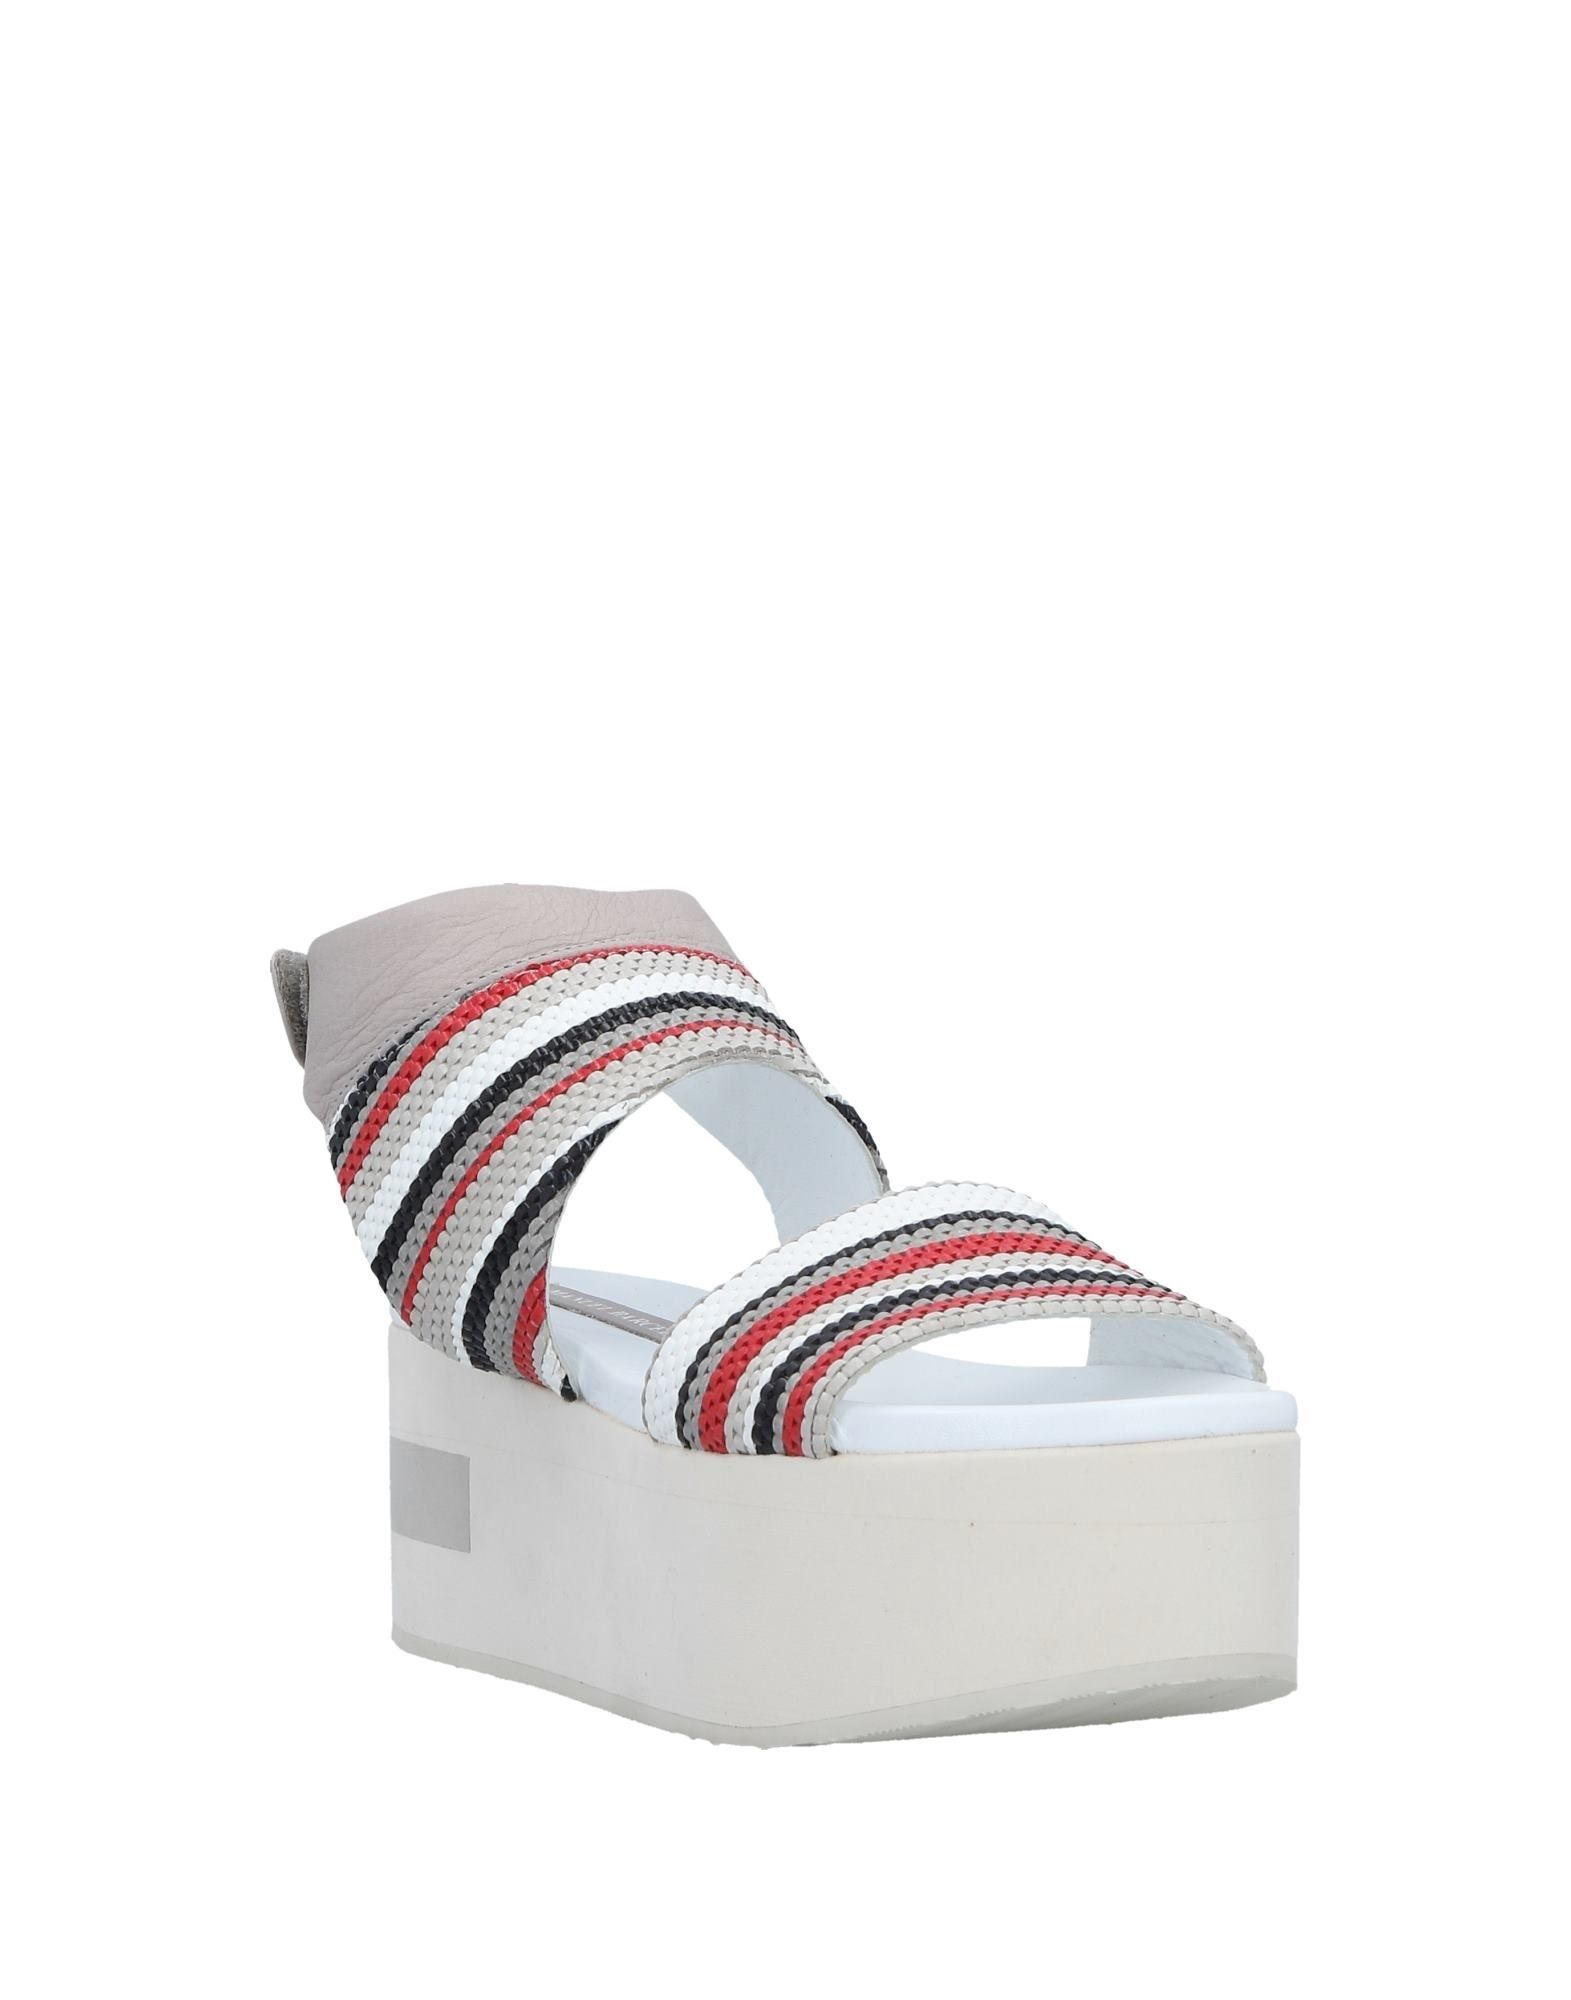 Stilvolle billige Schuhe  Manuel Barceló Sandalen Damen  Schuhe 11534782NC 90ccbf